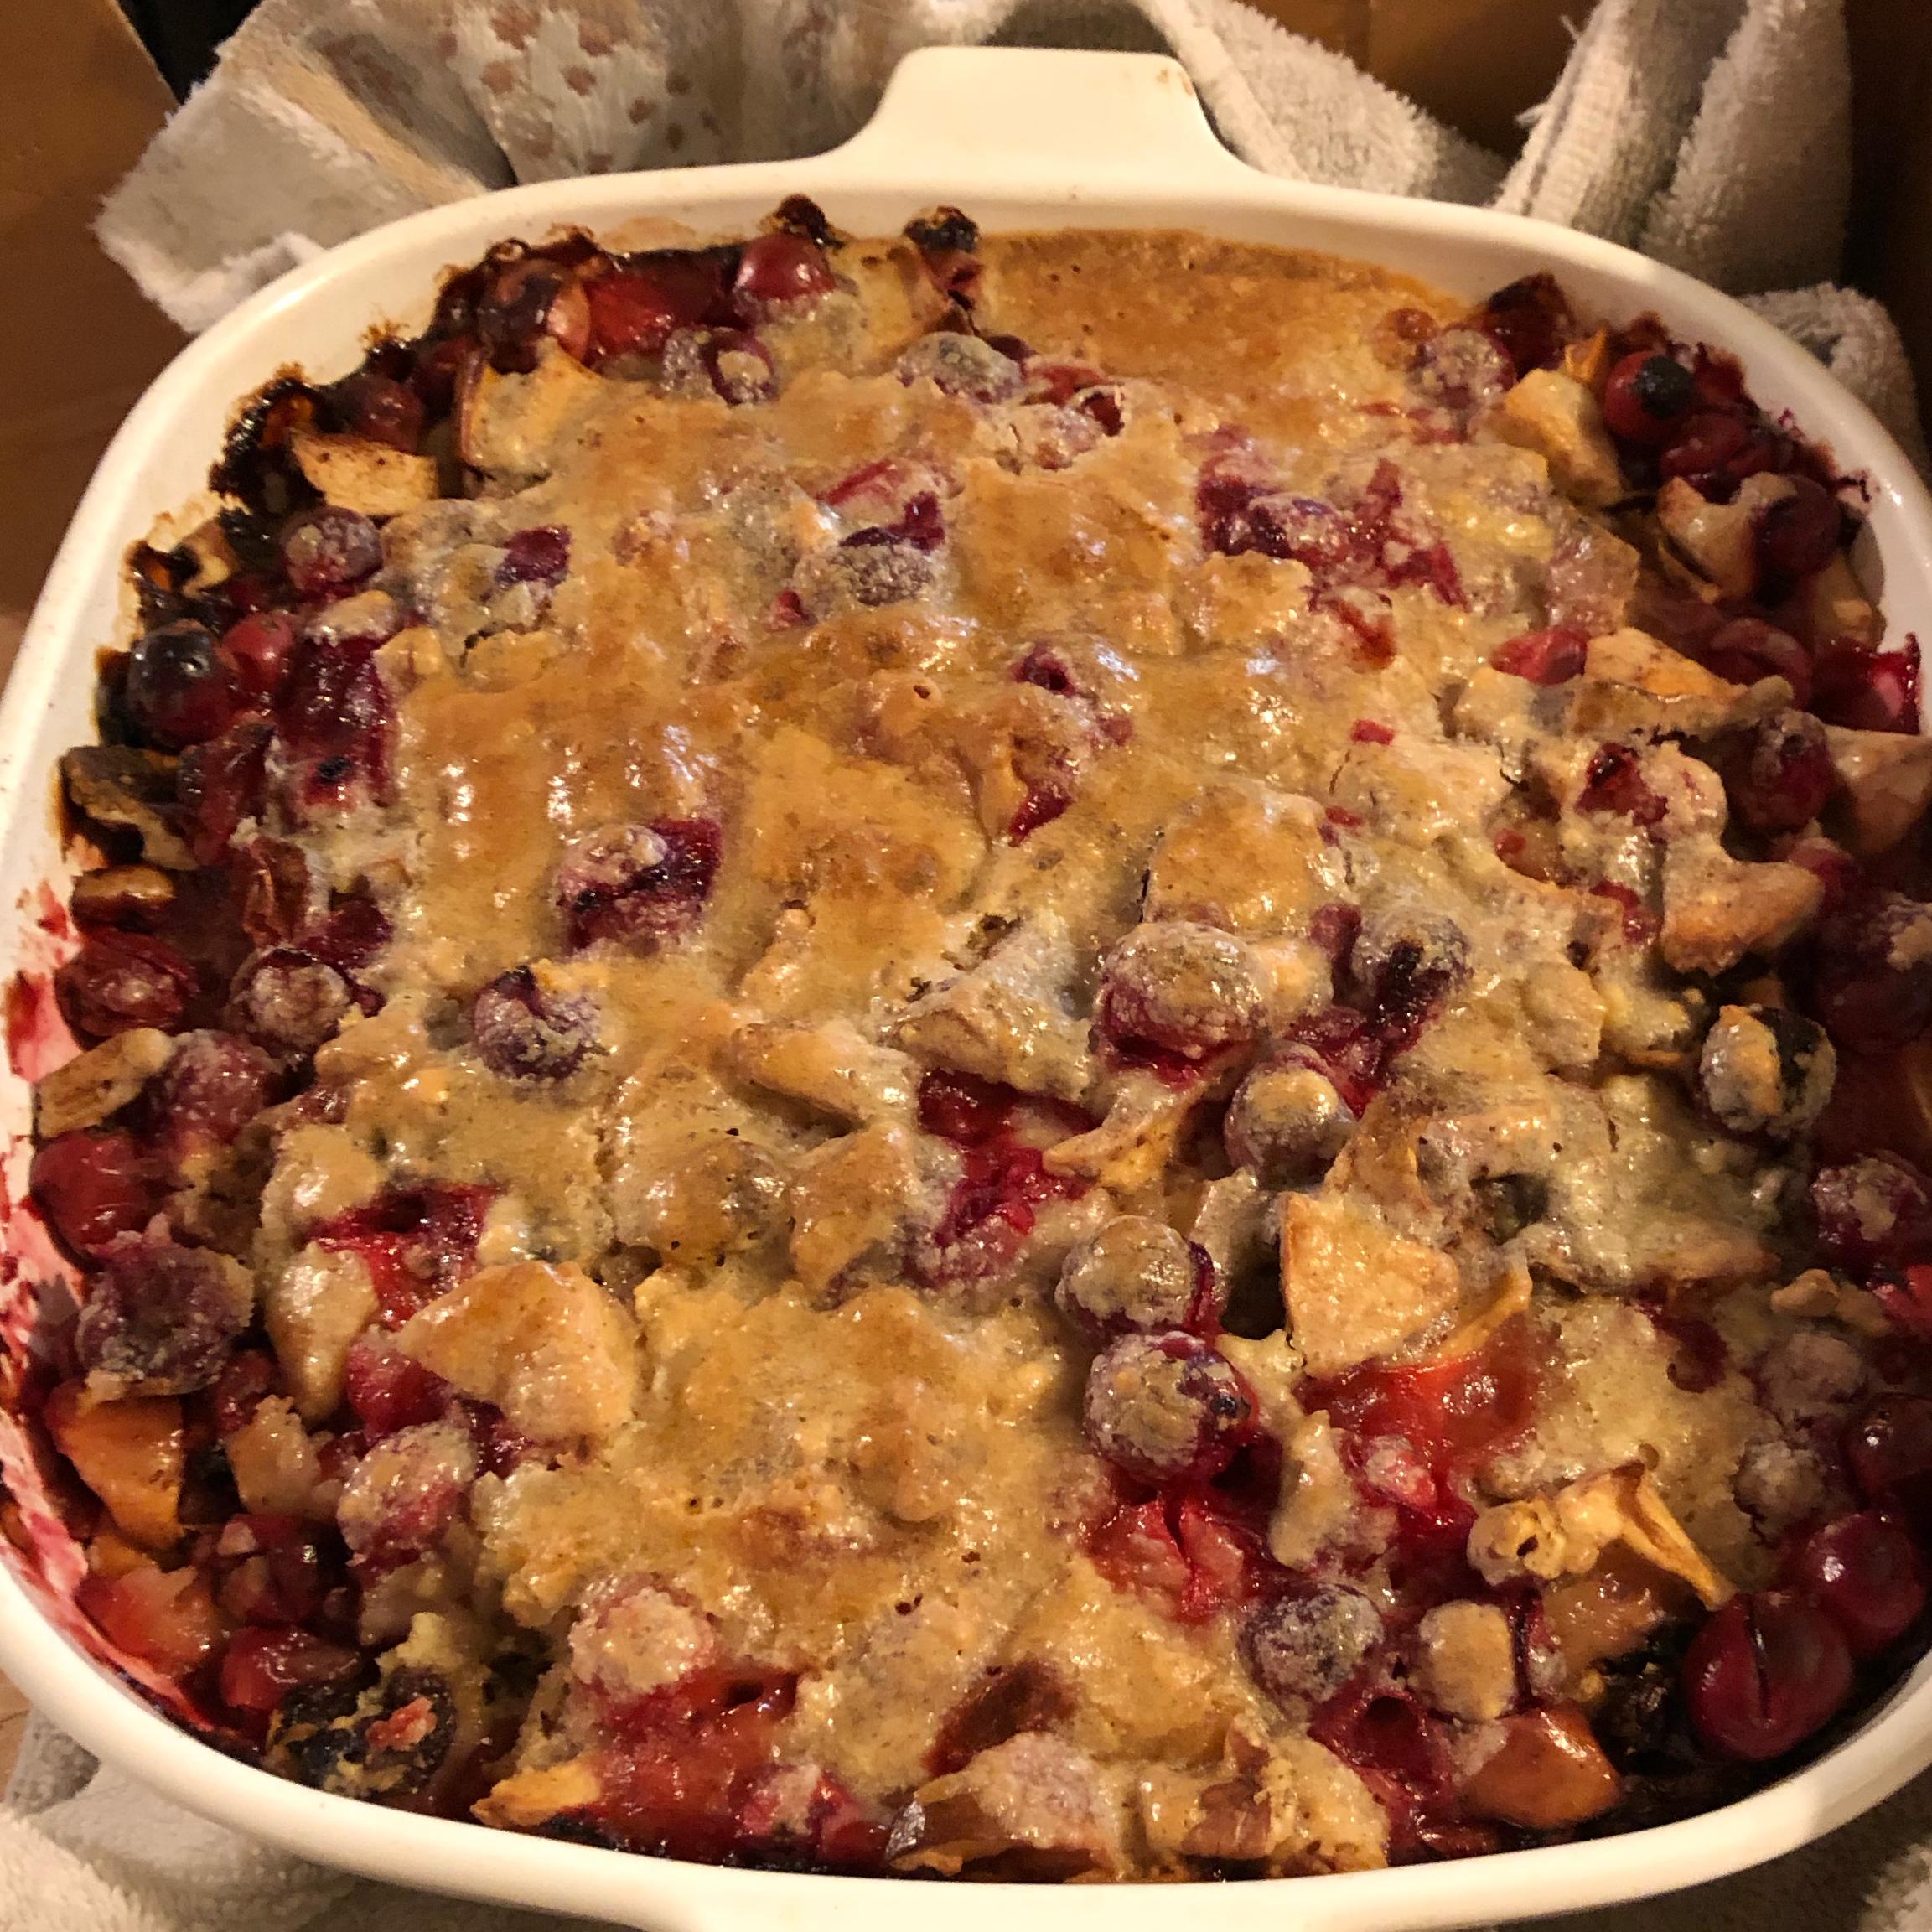 Apple-Cranberry Crumble Lisa Rivas